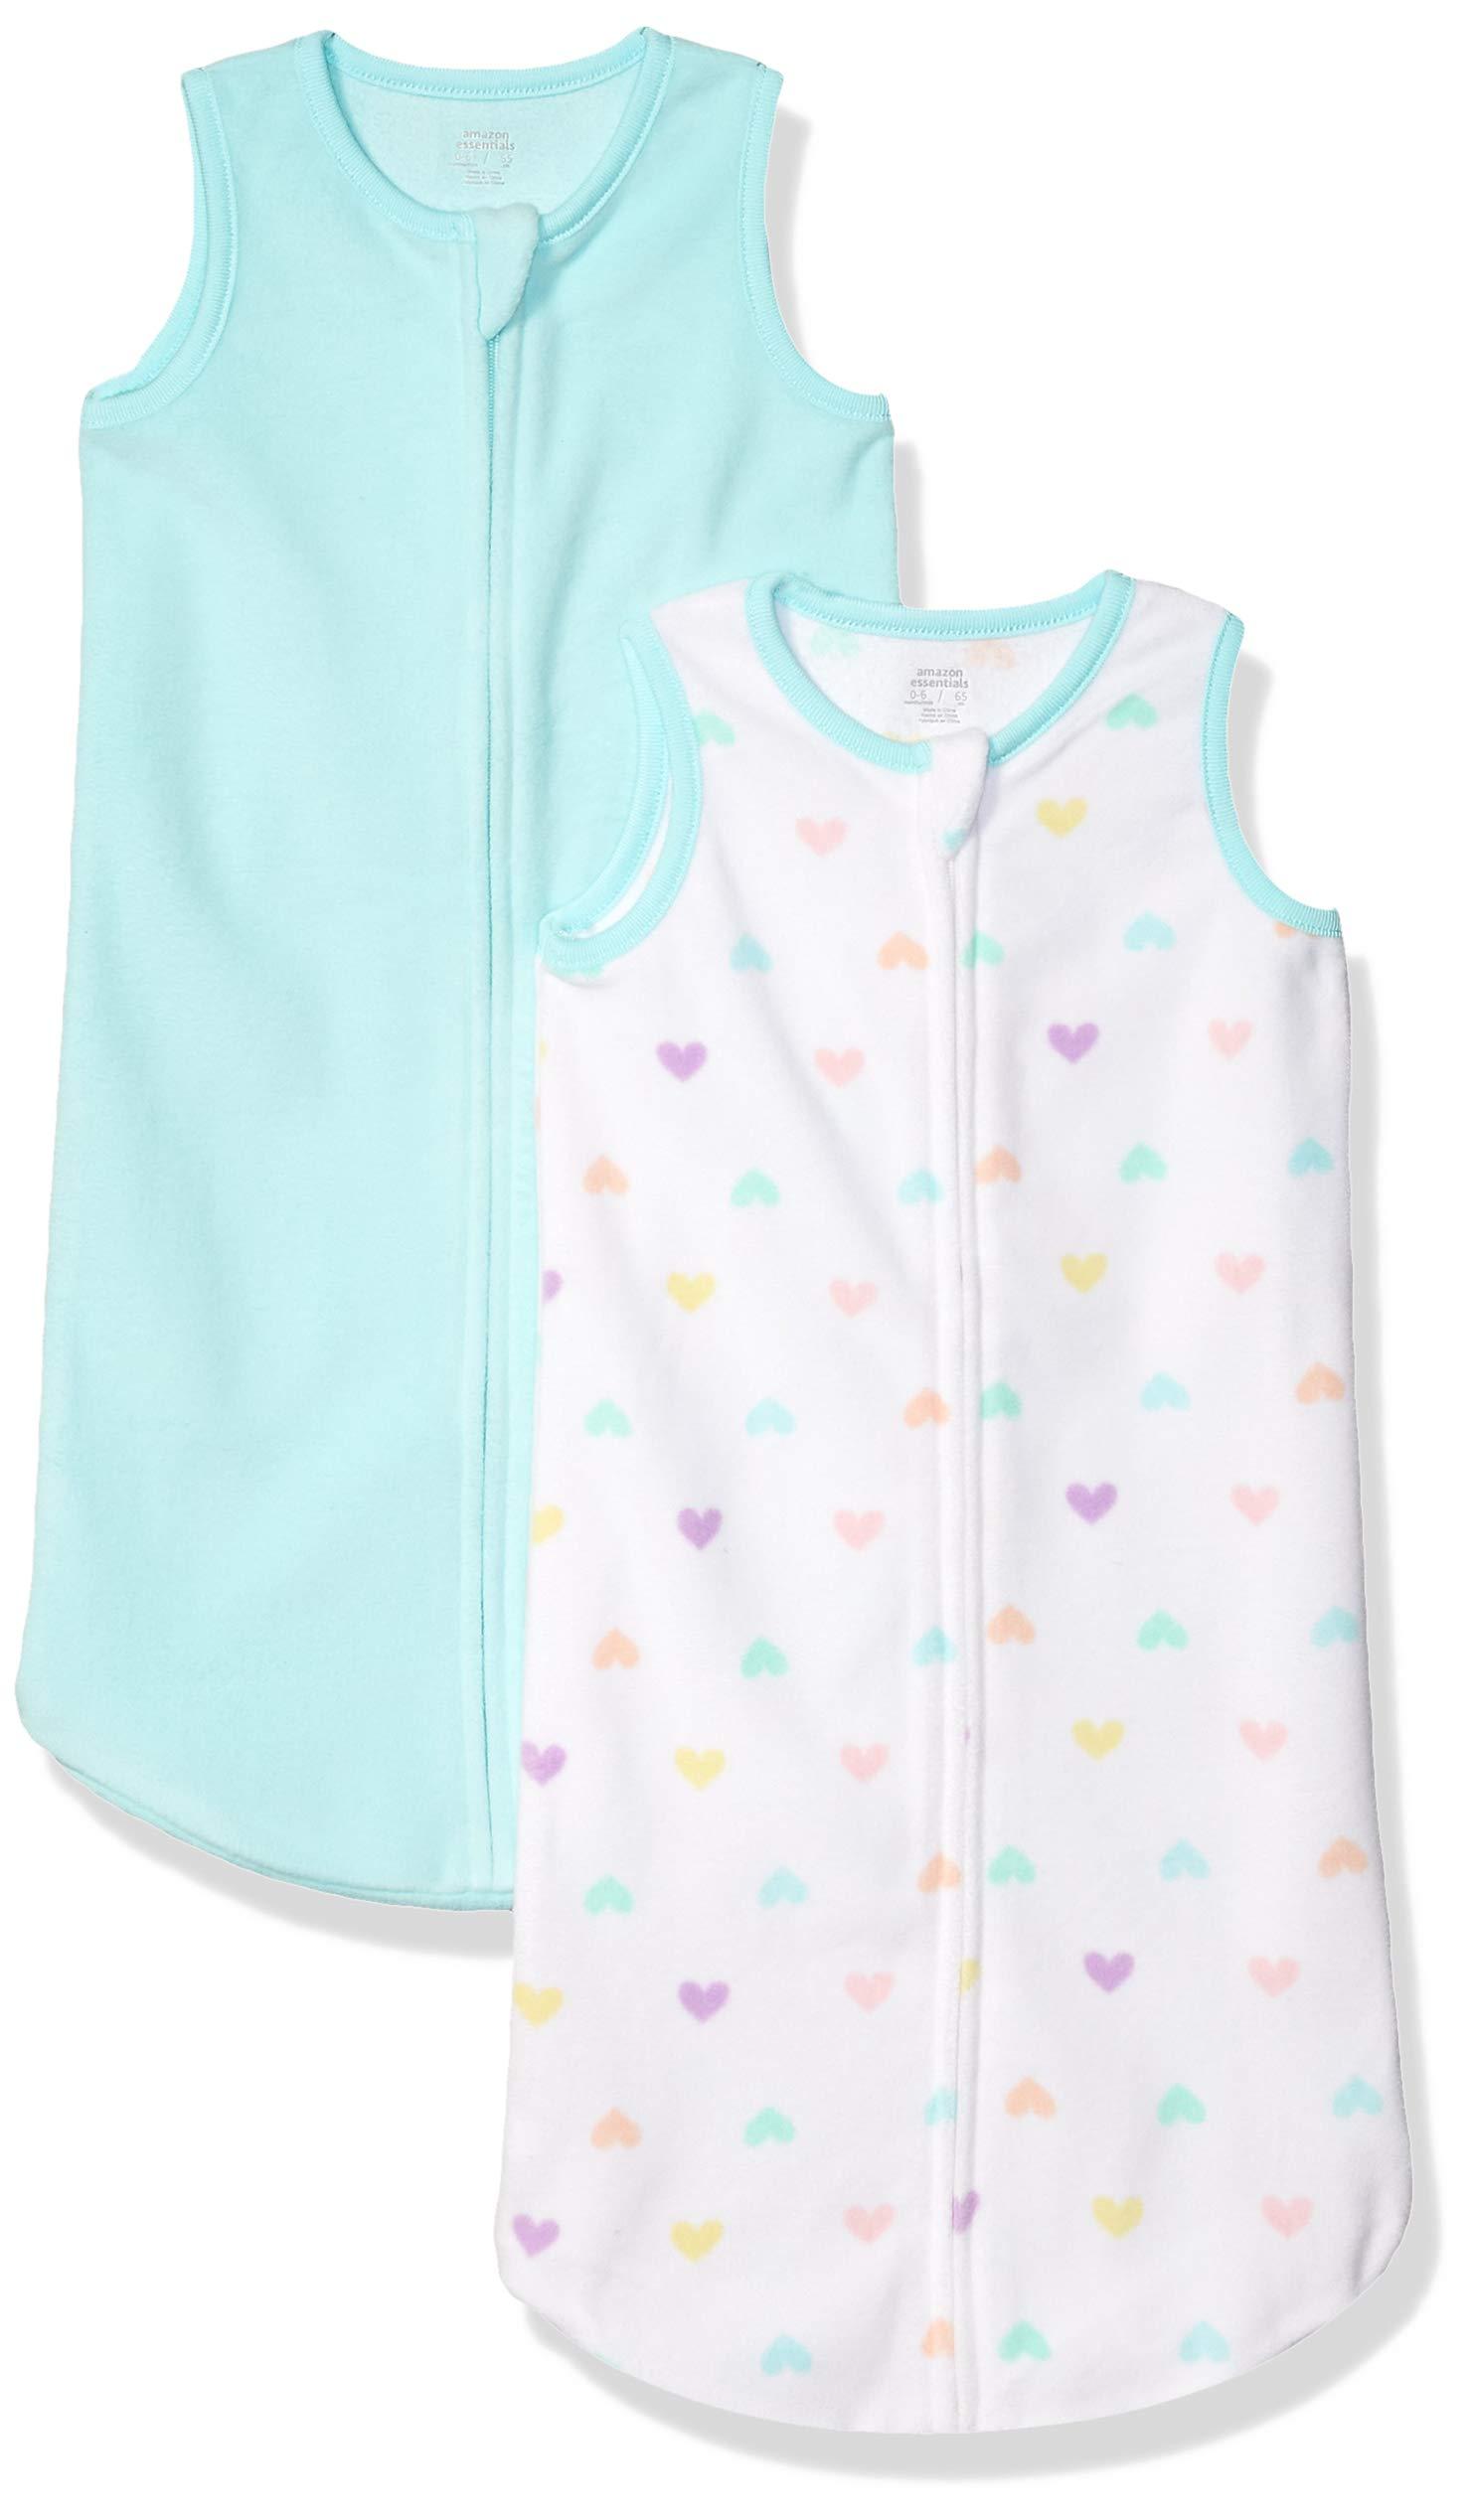 Amazon Essentials Saco de Dormir para Bebé de Microfibra, Paquete de 2 - Infant-and-Toddler-Sleepers Bebé-Niñas 1